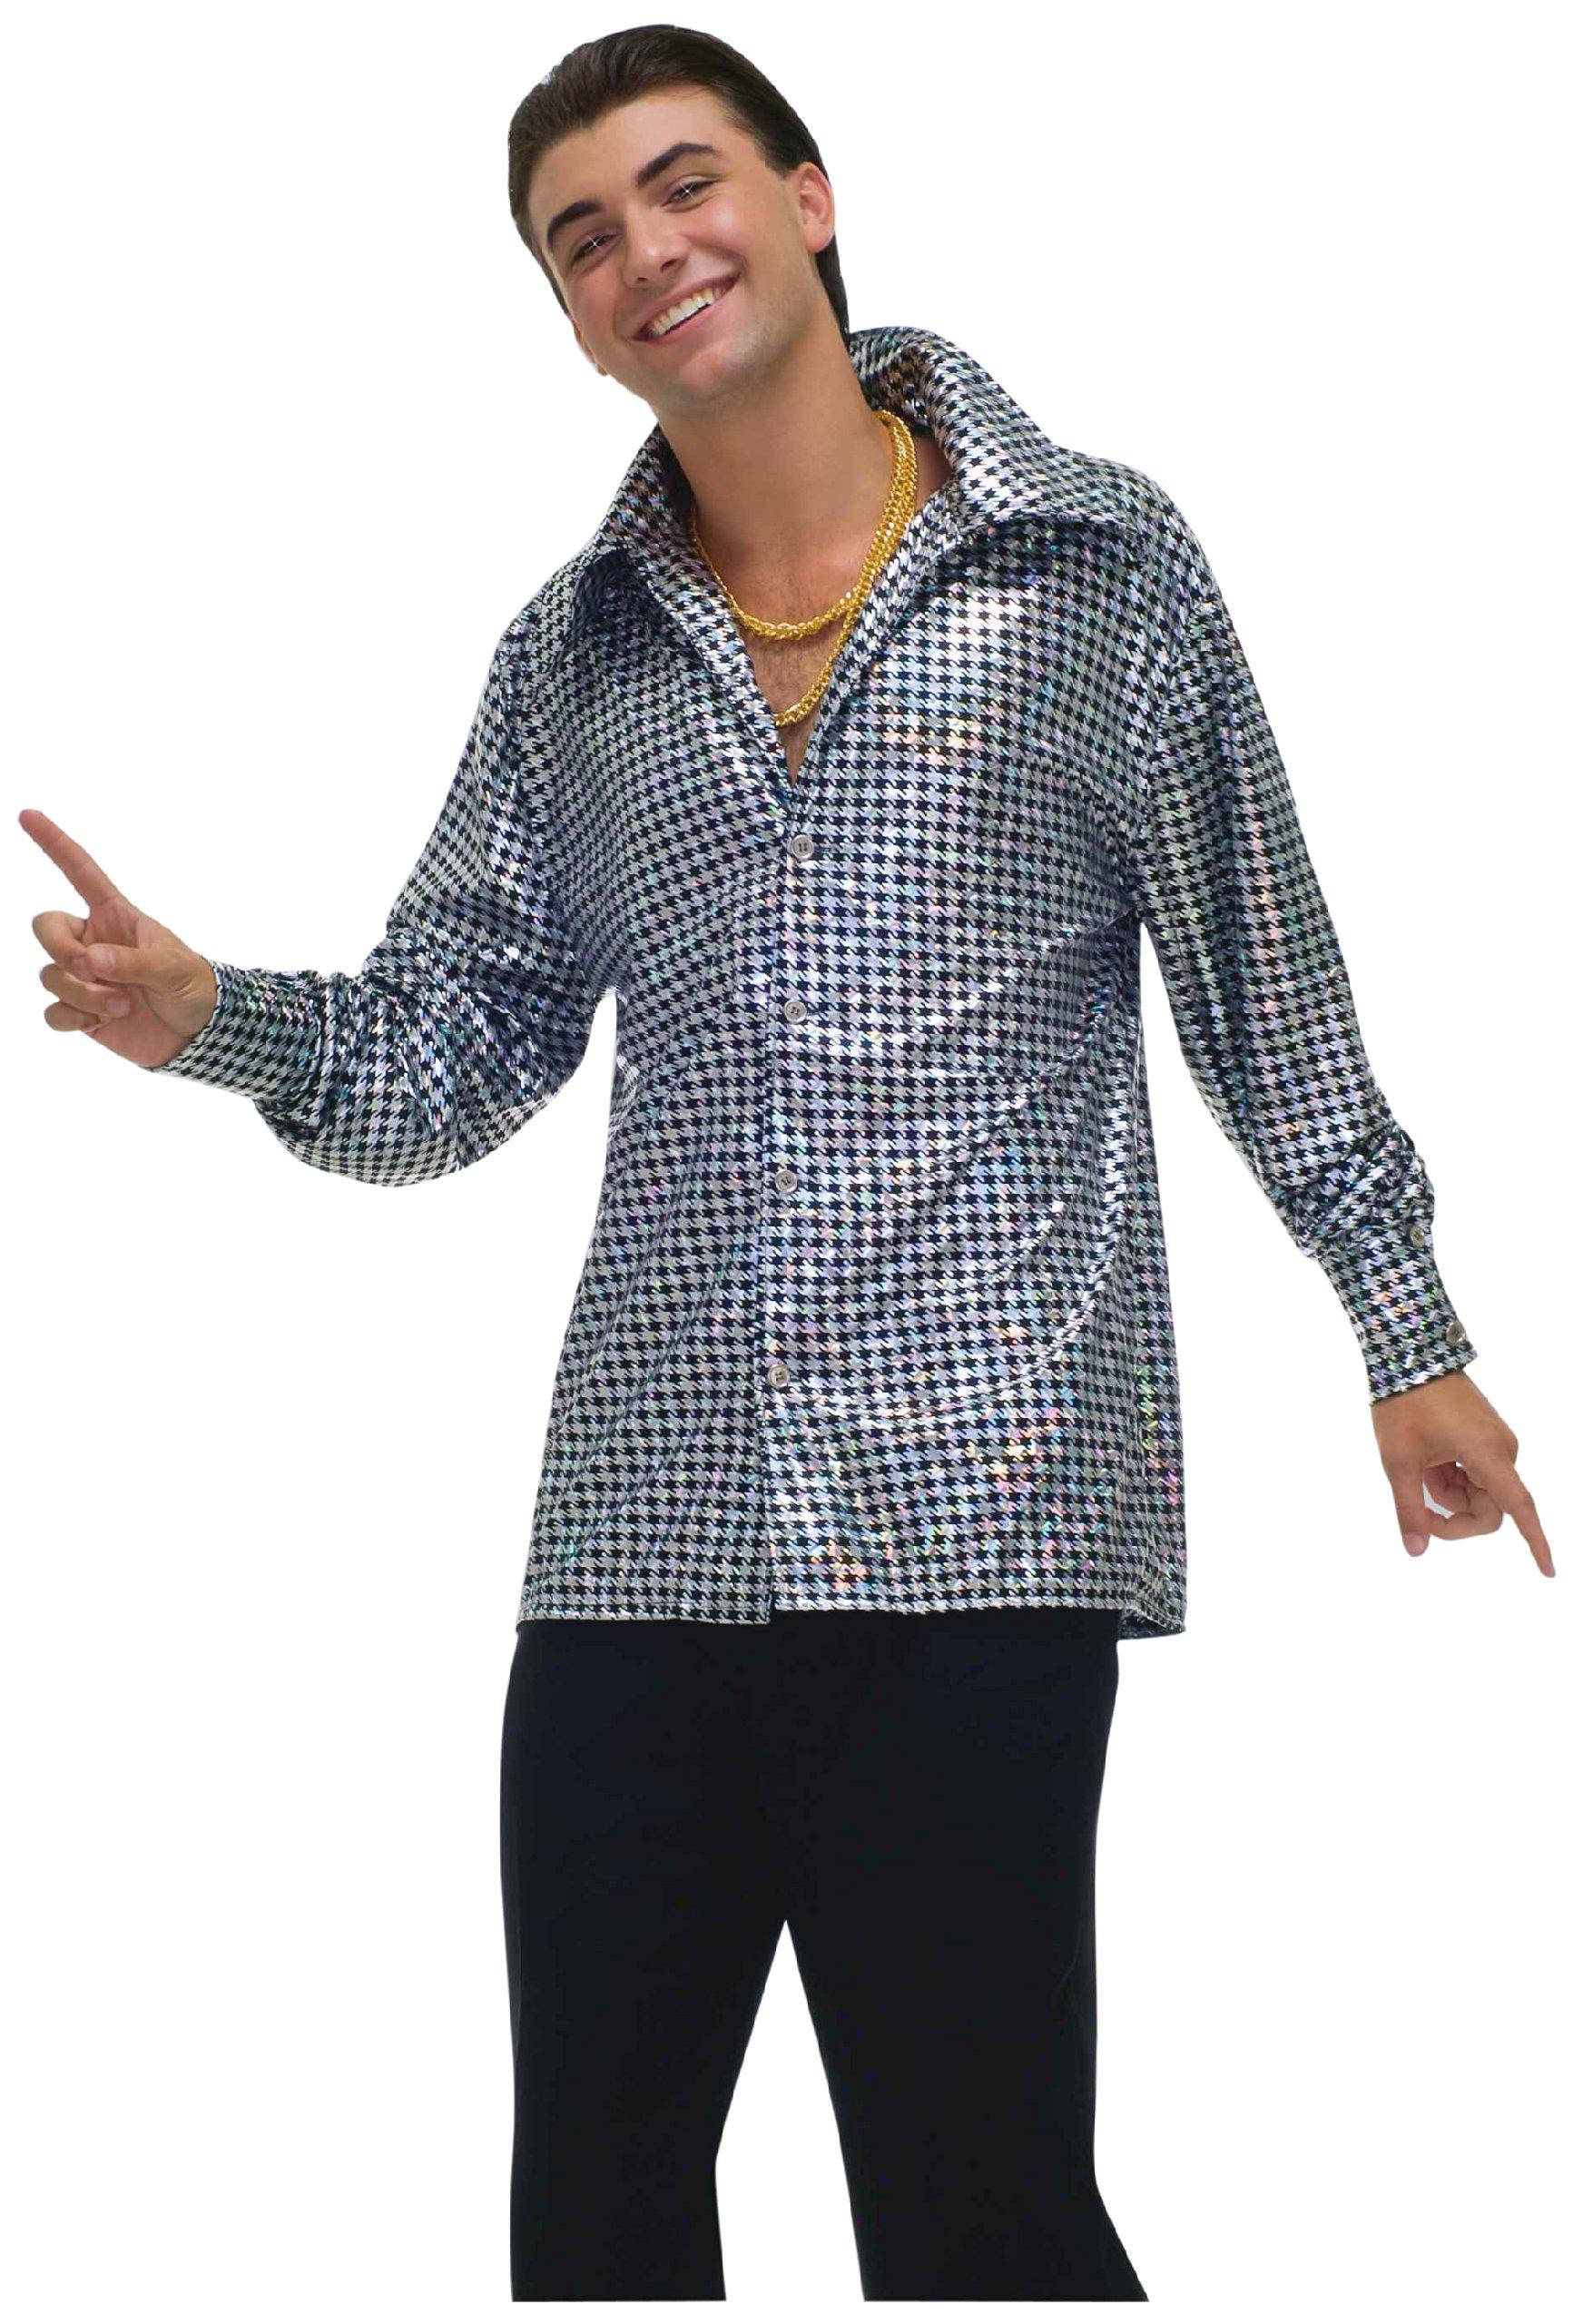 Forum Novelties Men's Plus-Size 70's Disco Fever Hustling Hunk Costume Shirt, Black//White, Plus